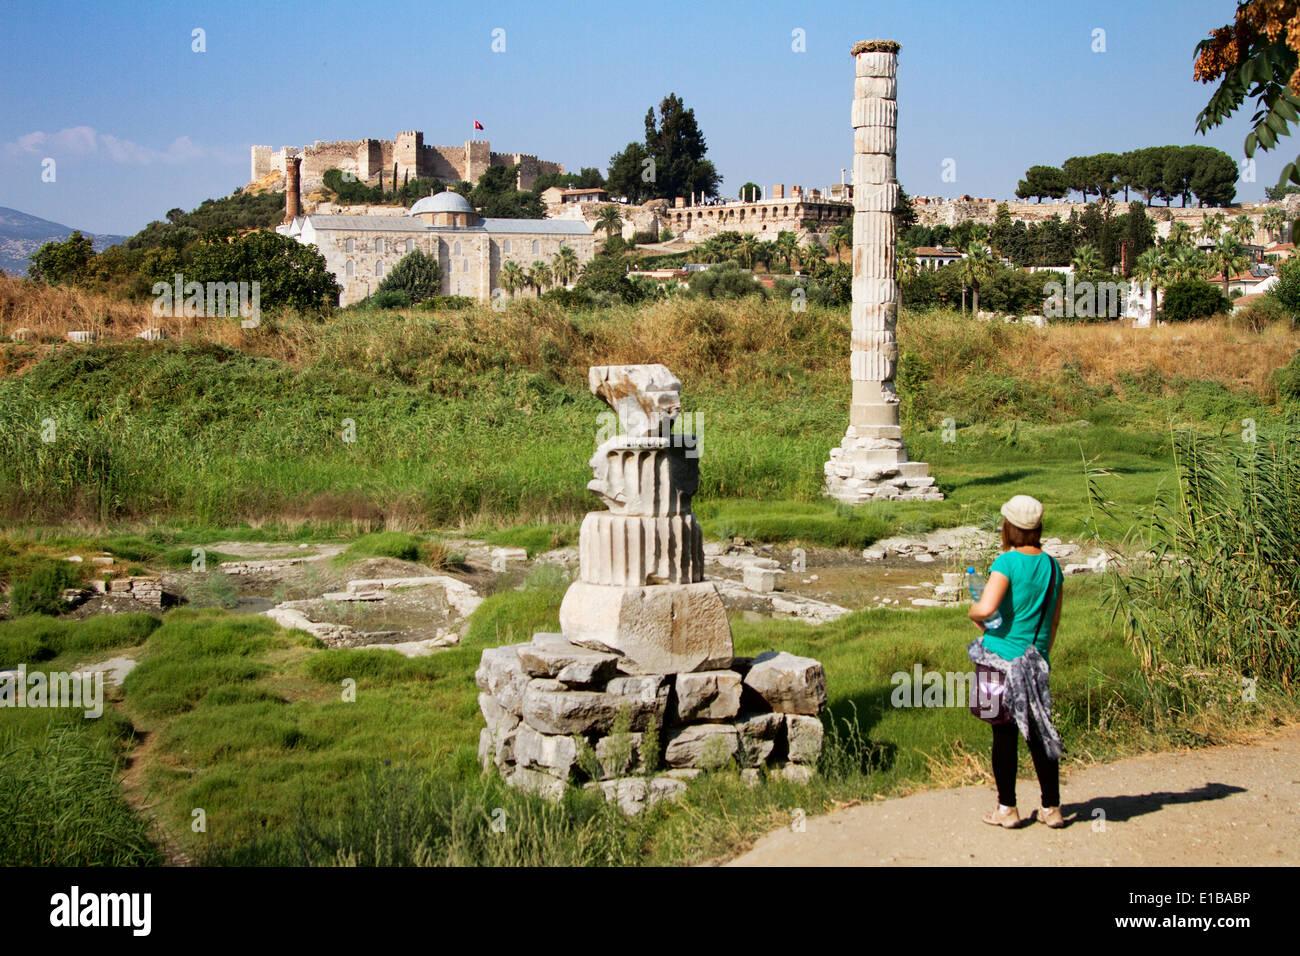 Turkey Izmir Selçuk Temple of Artemis Temple of Diana Temple Artemis Seven Wonders of the Ancient World Seven Wonders Ancient Wo - Stock Image